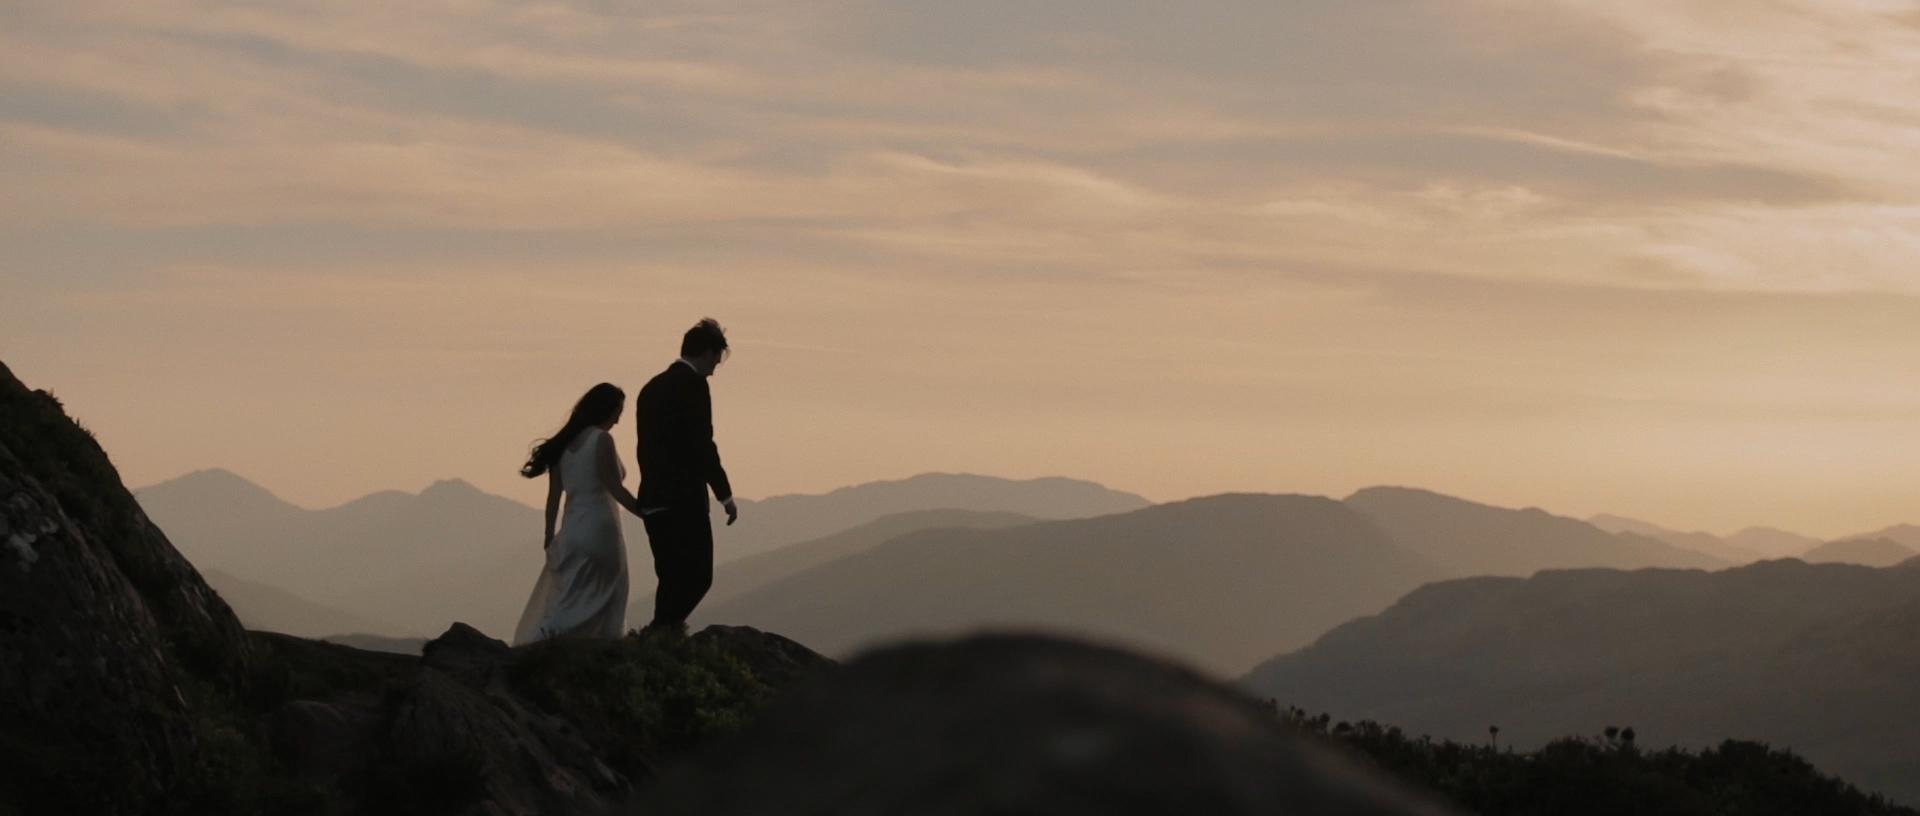 ggs-yard-wedding-videographer_LL_01.jpg